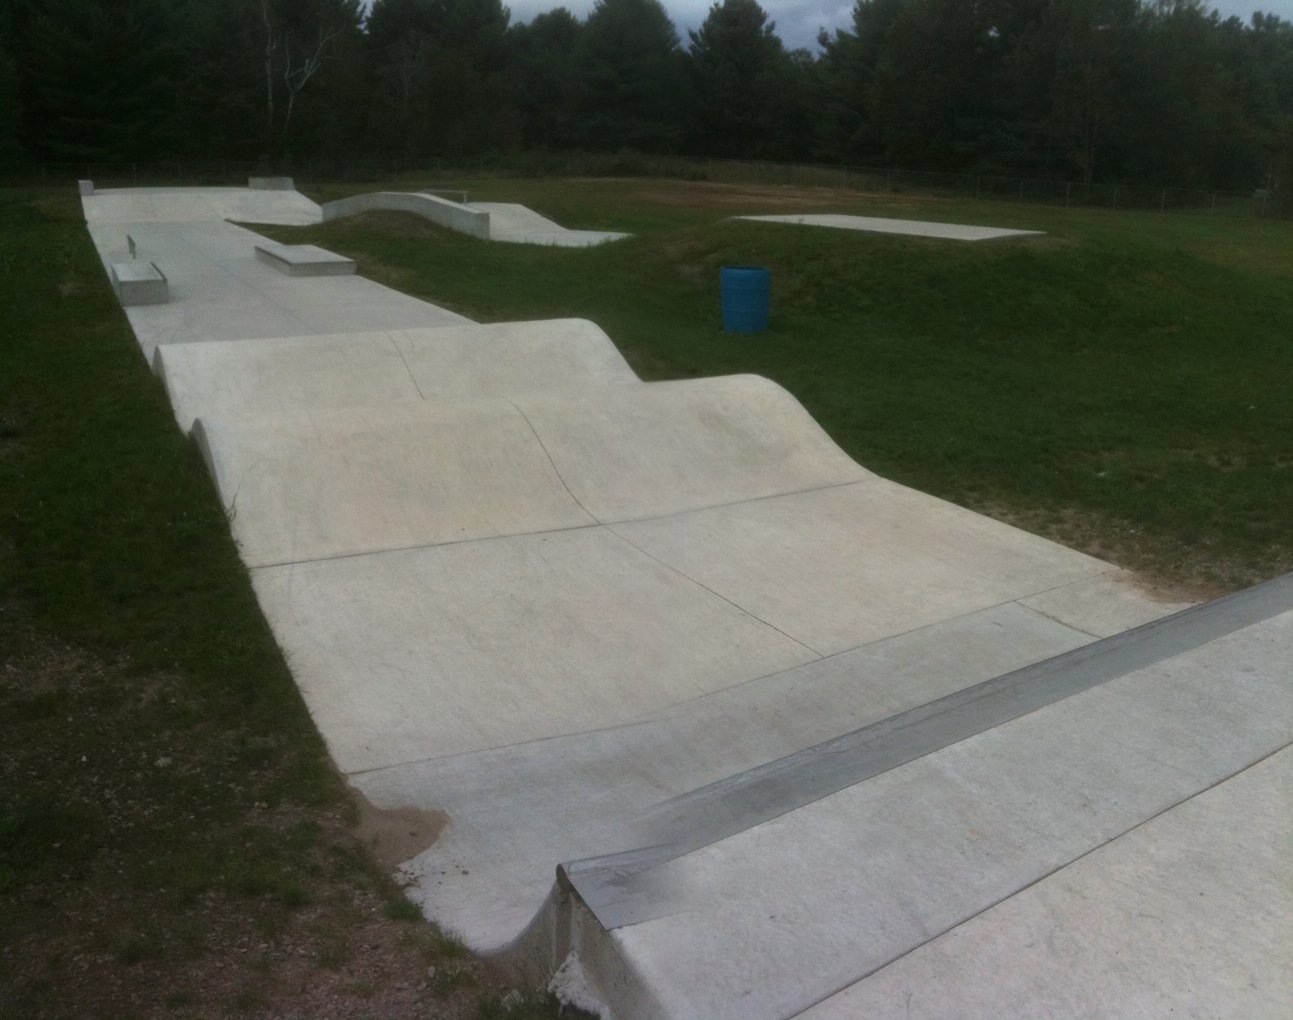 northbrook skatepark